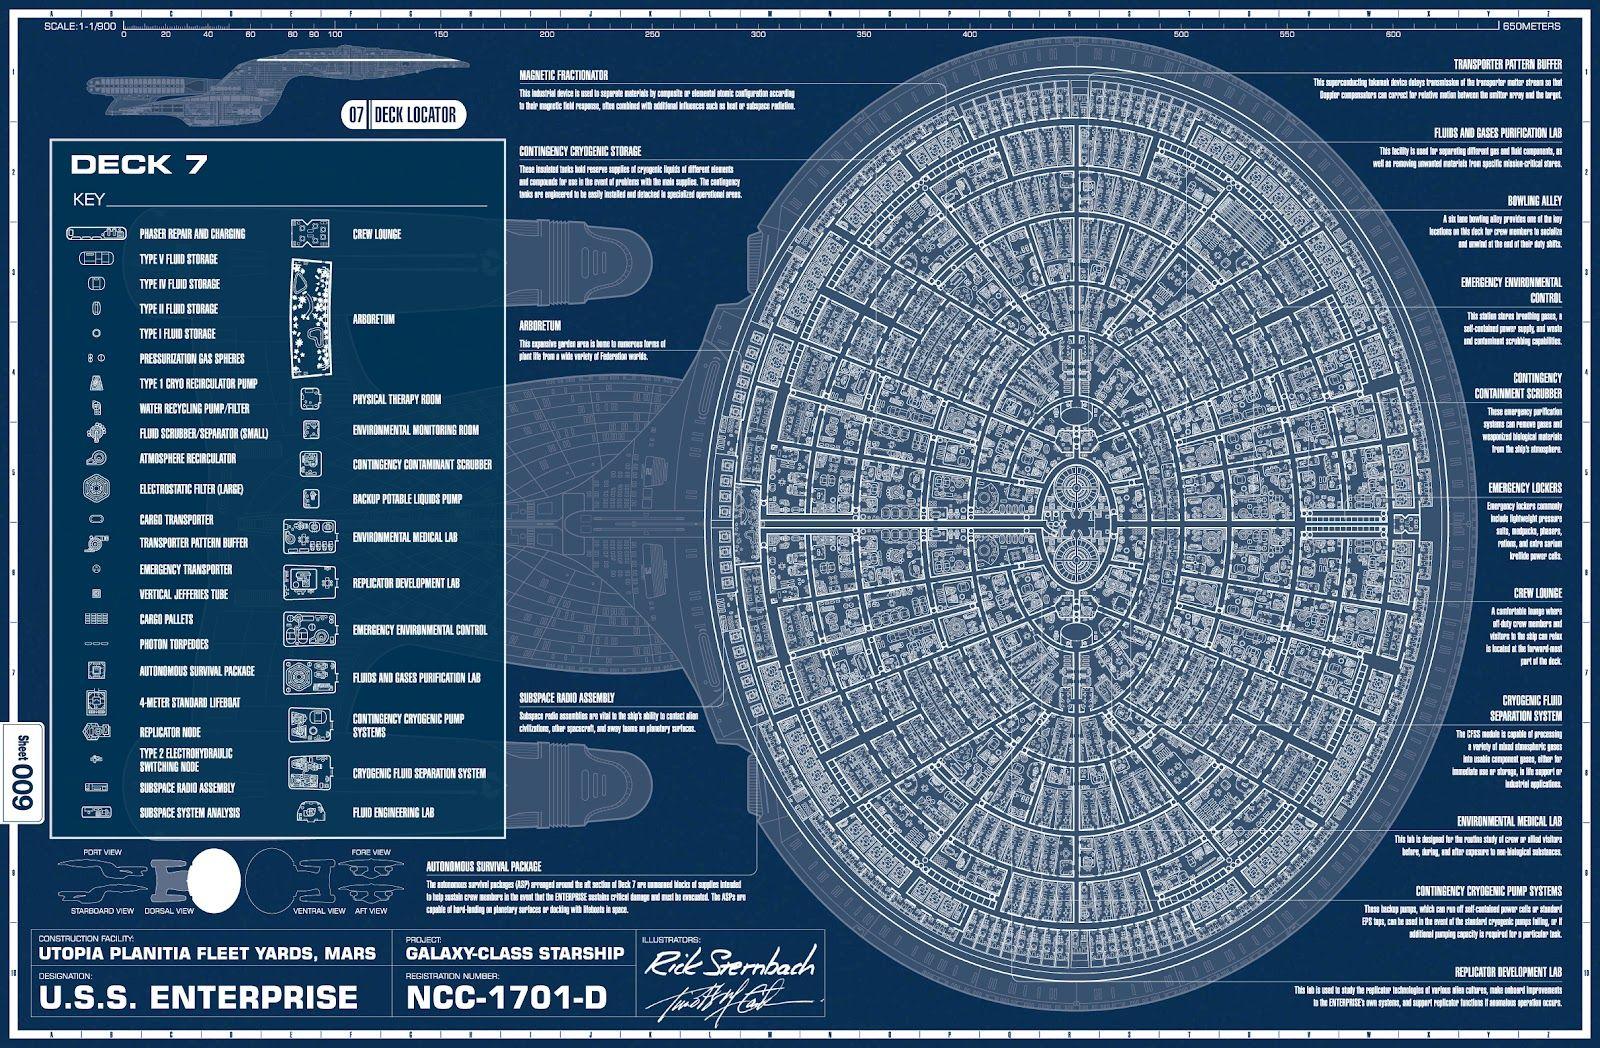 Star trek book okudas onboard the uss enterprise bbs sci fi uss enterprise d deck plans malvernweather Choice Image